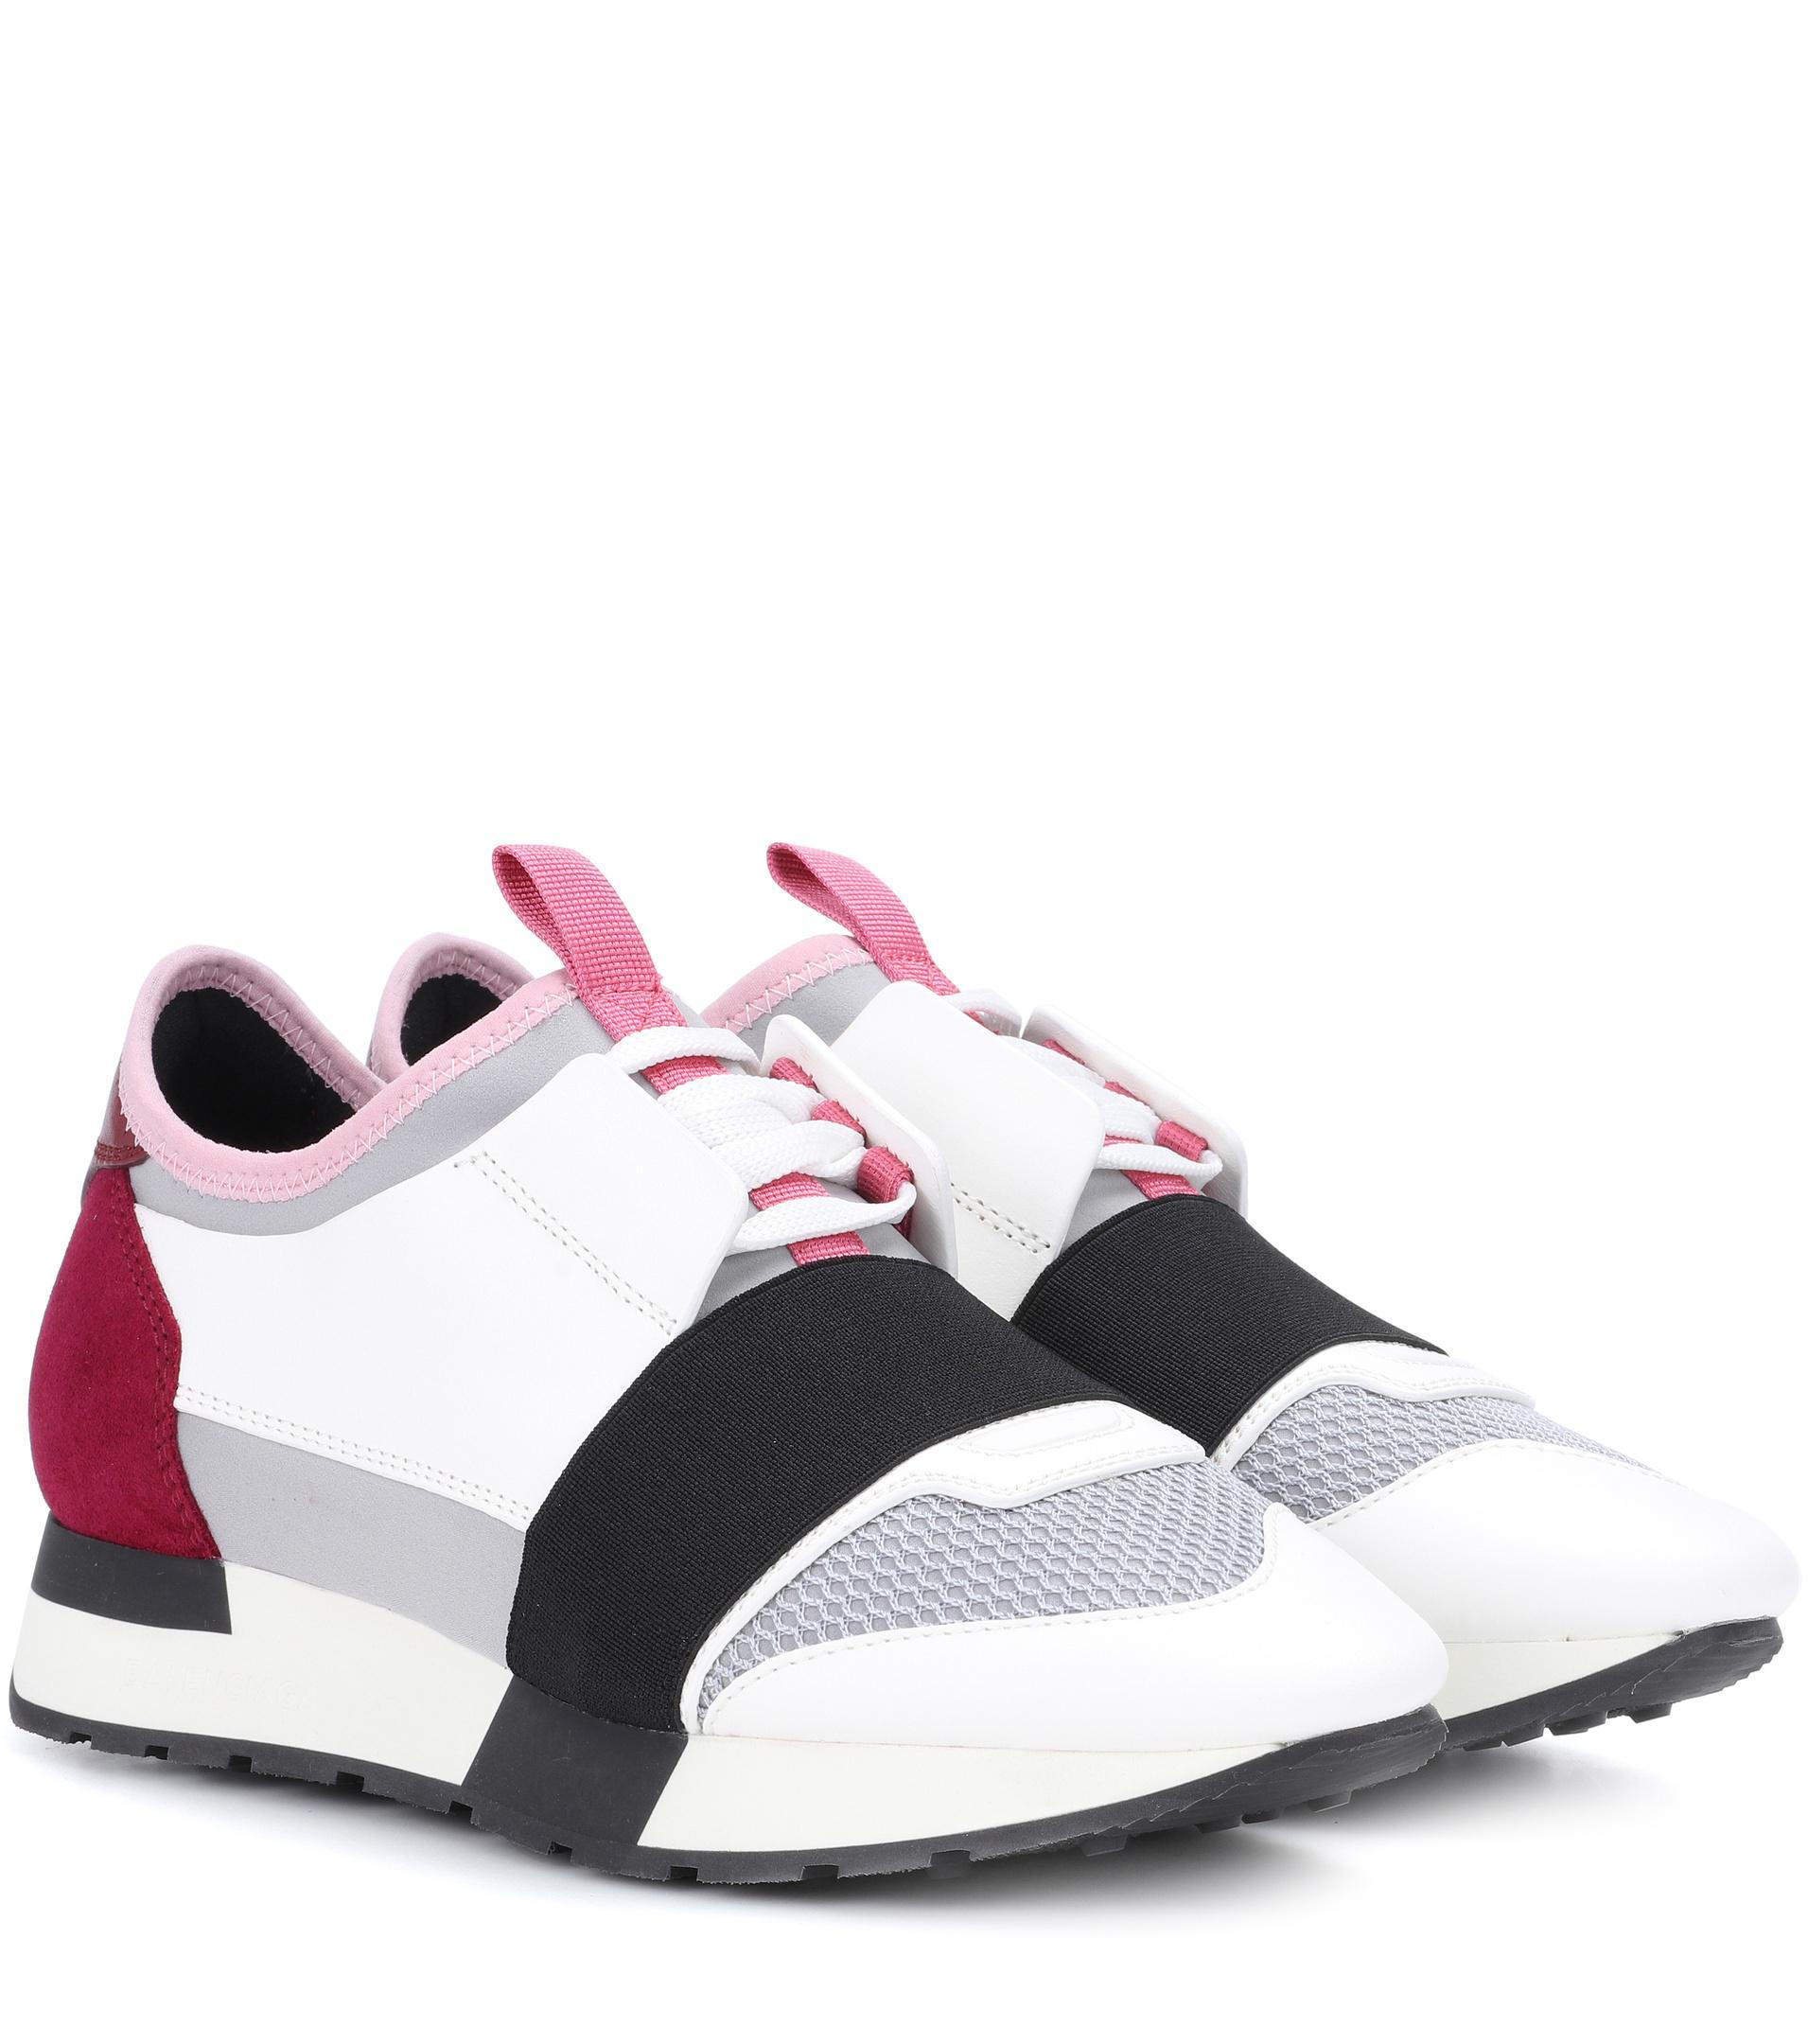 Sneaker RACE RUNNER calfskin mesh textile multicoloured Balenciaga a5c2JAikD0